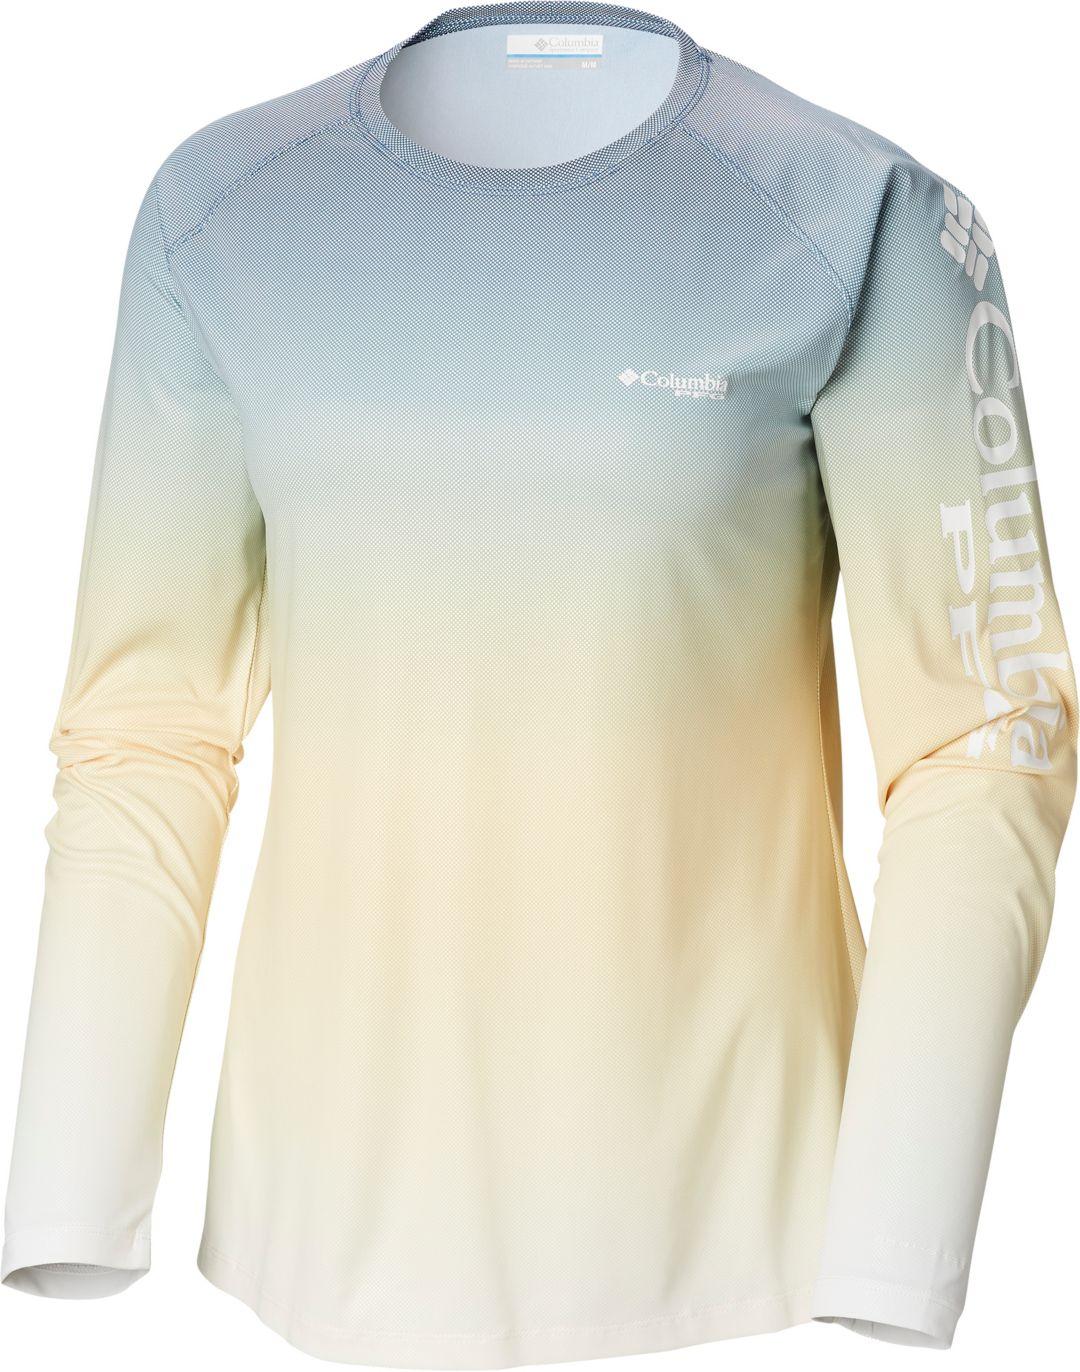 61ab9ad6f9 Columbia Women's Tidal Deflector Long Sleeve Shirt